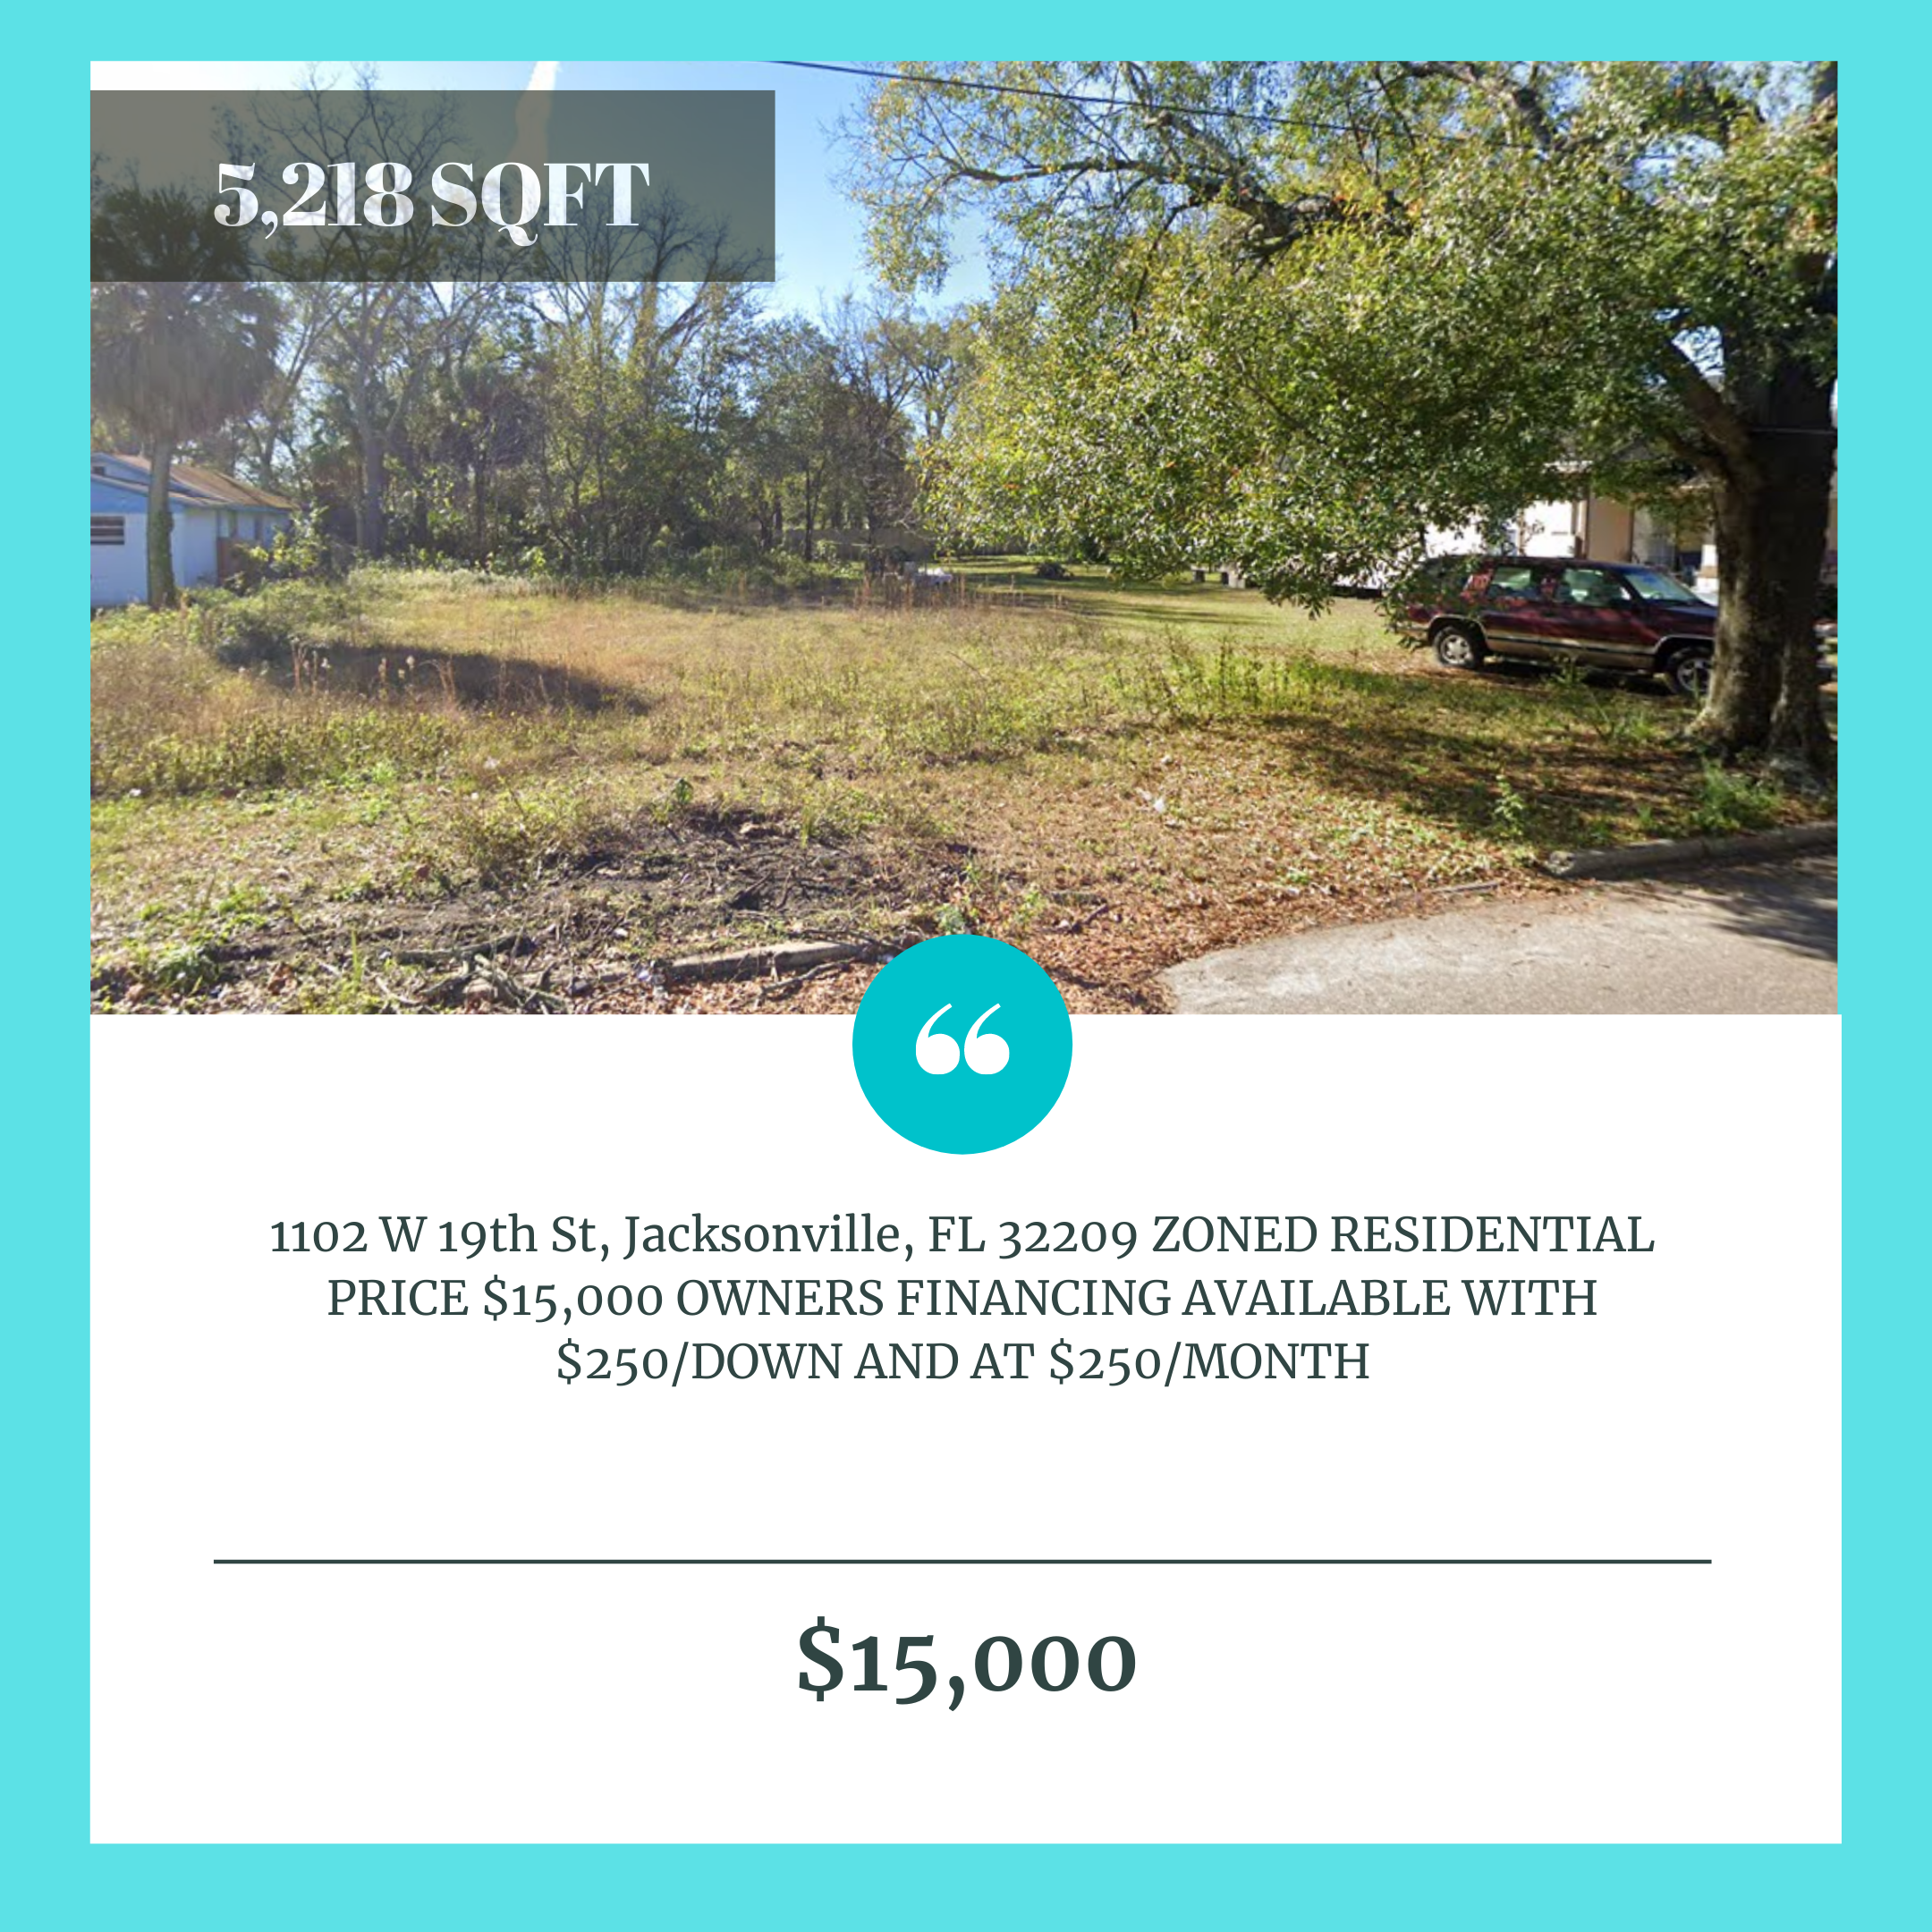 1102 W 19TH ST, JACKSONVILLE FL 32209